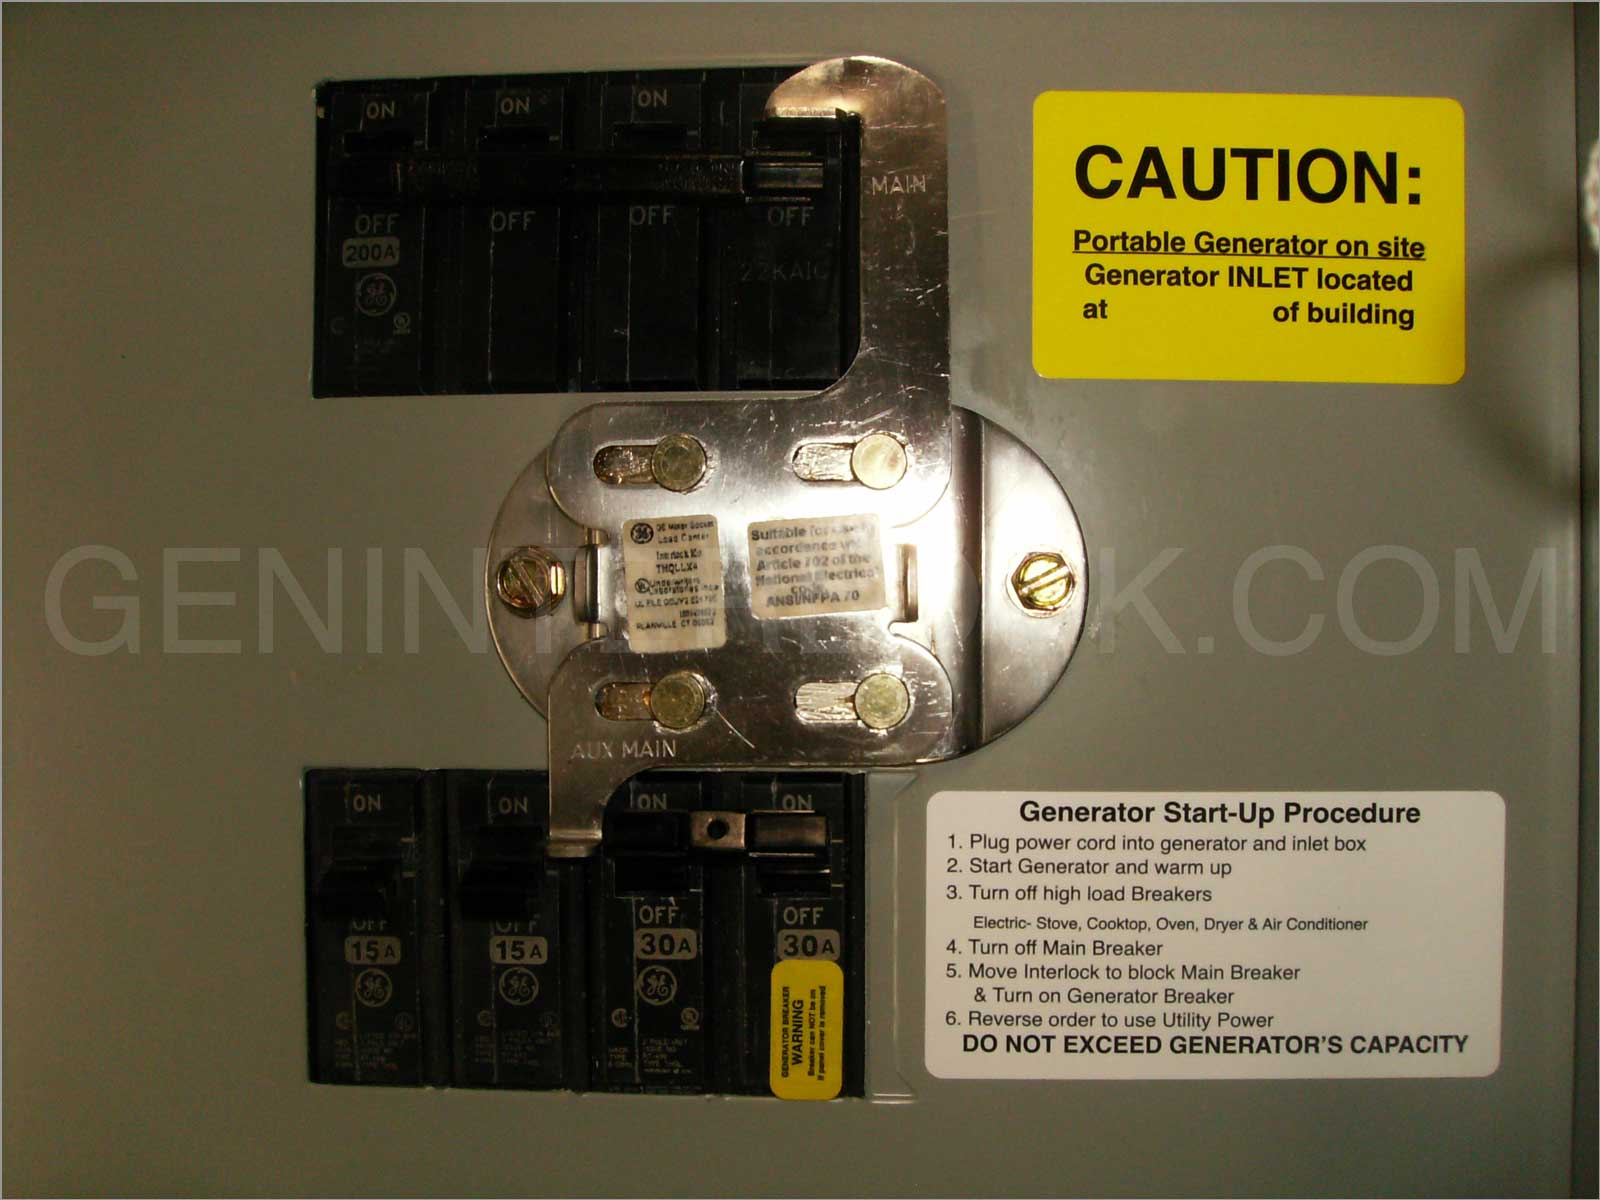 Interlock device installation